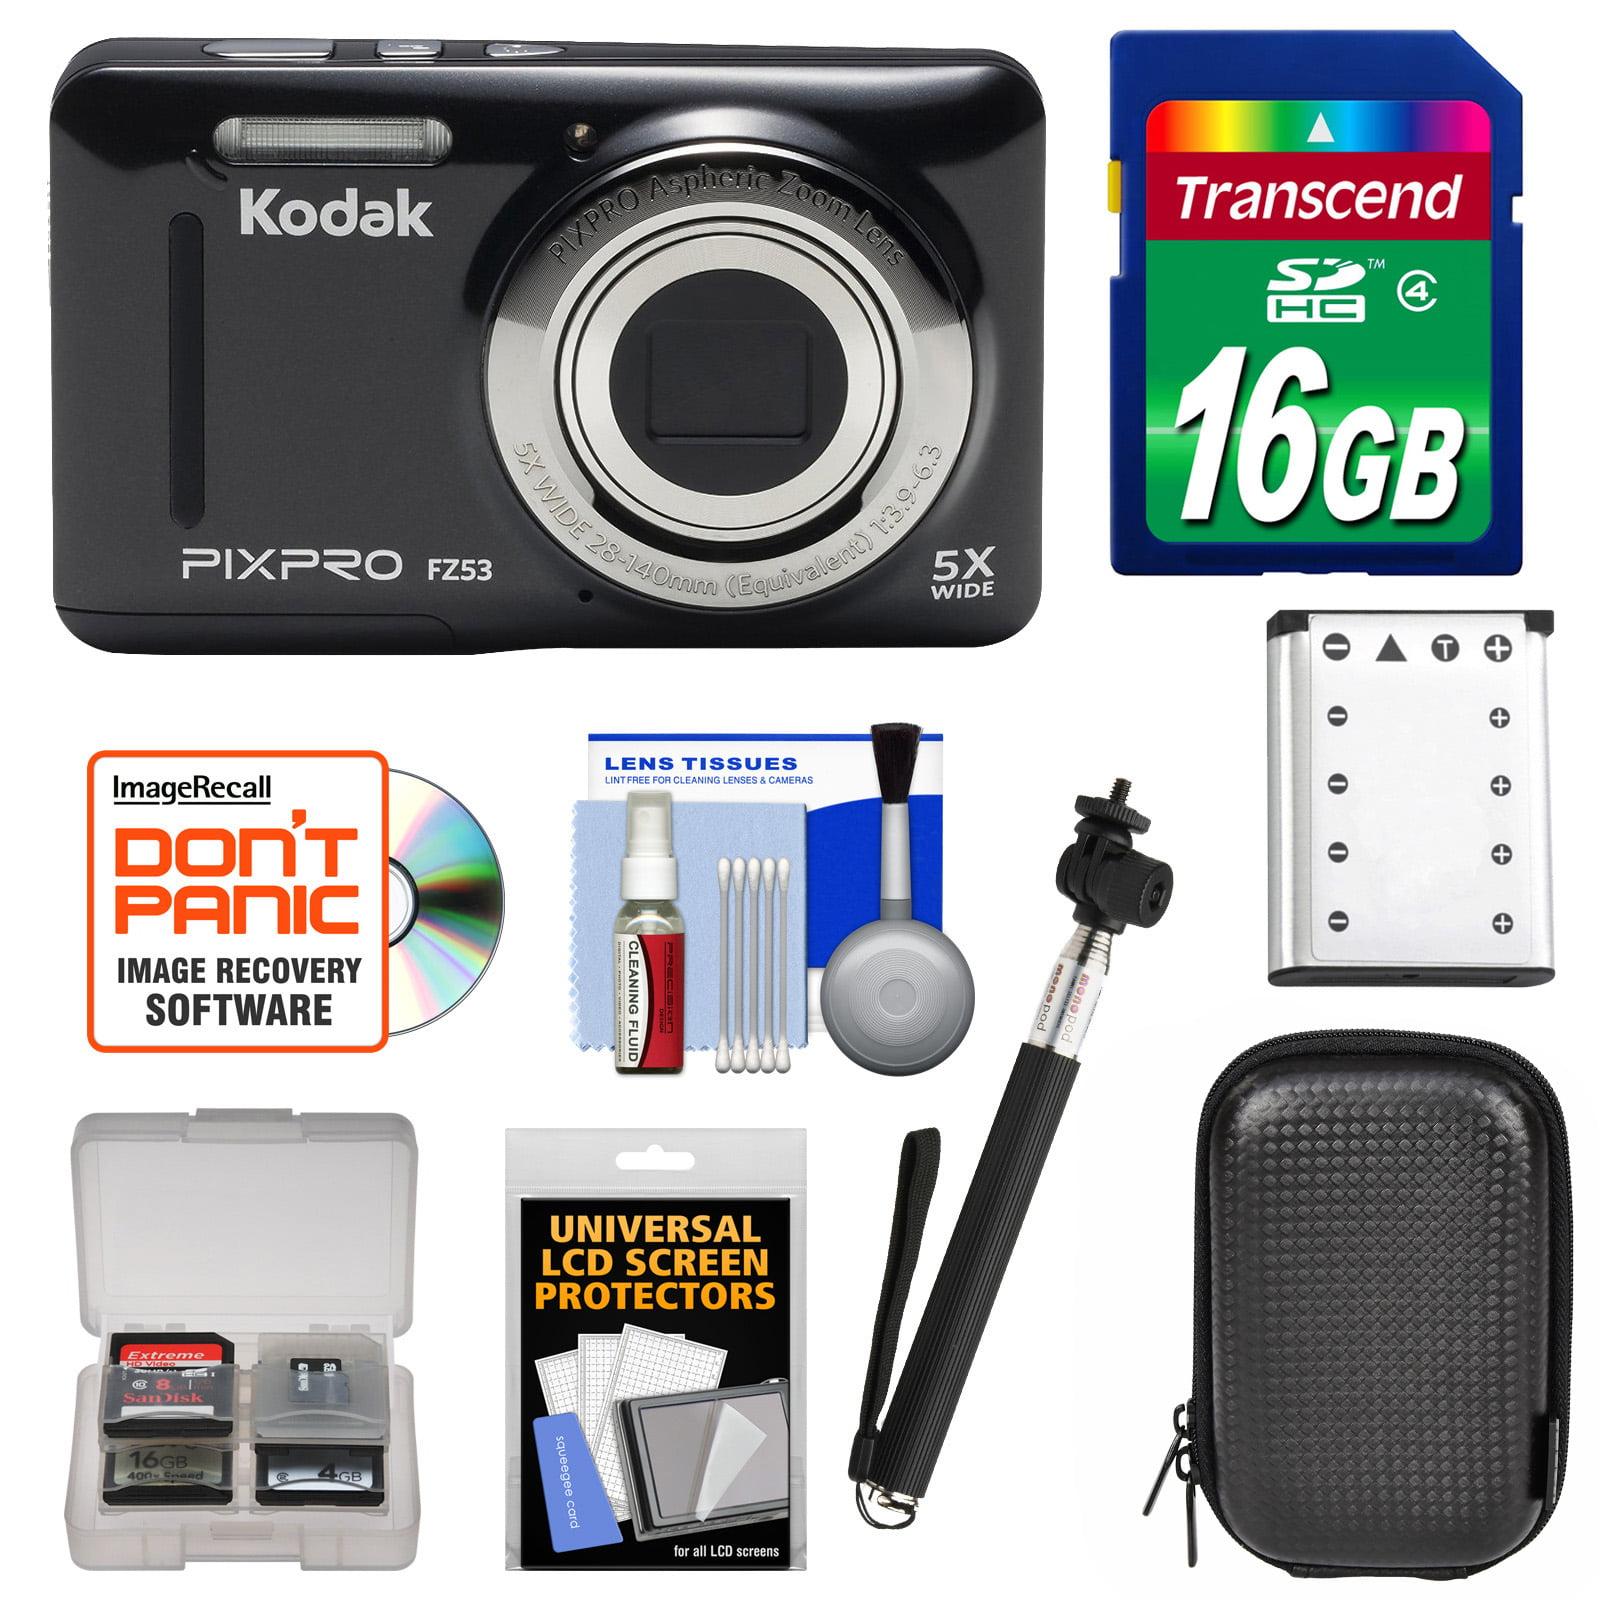 KODAK PIXPRO Friendly Zoom FZ53 Digital Camera (Black) with 16GB Card + Battery + Case + Selfie Stick + Kit